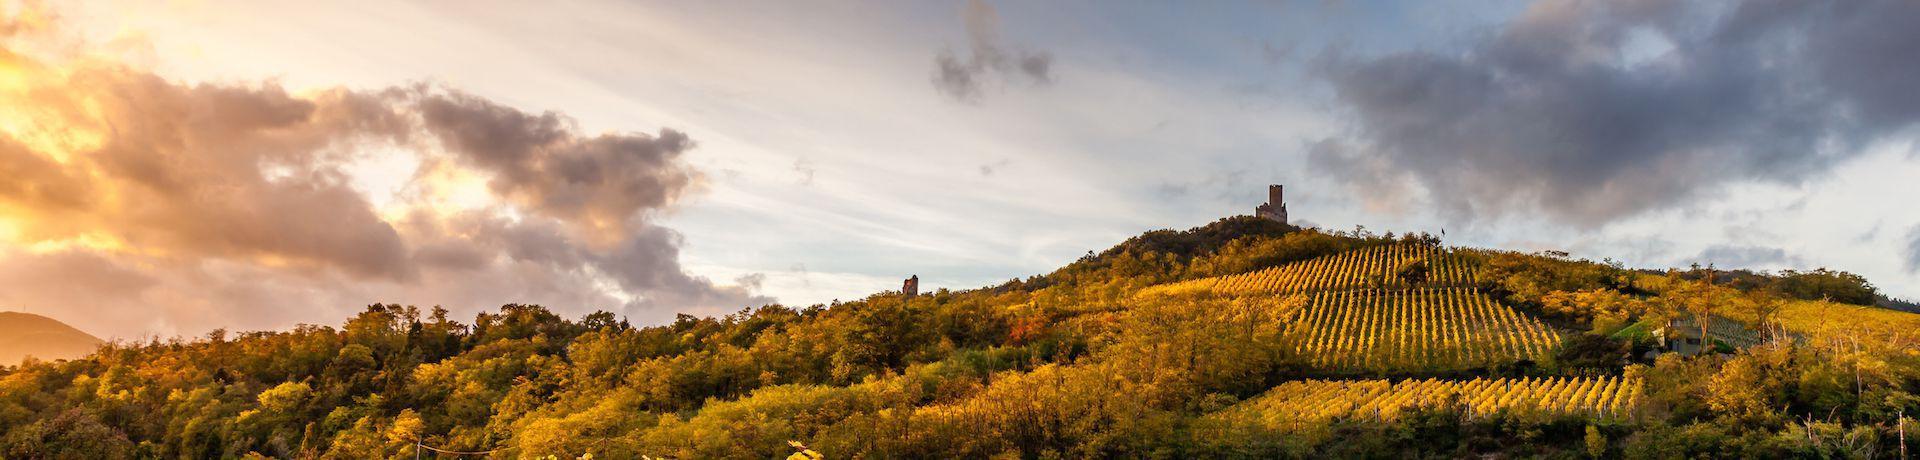 Supertrips - Glamping Dordogne